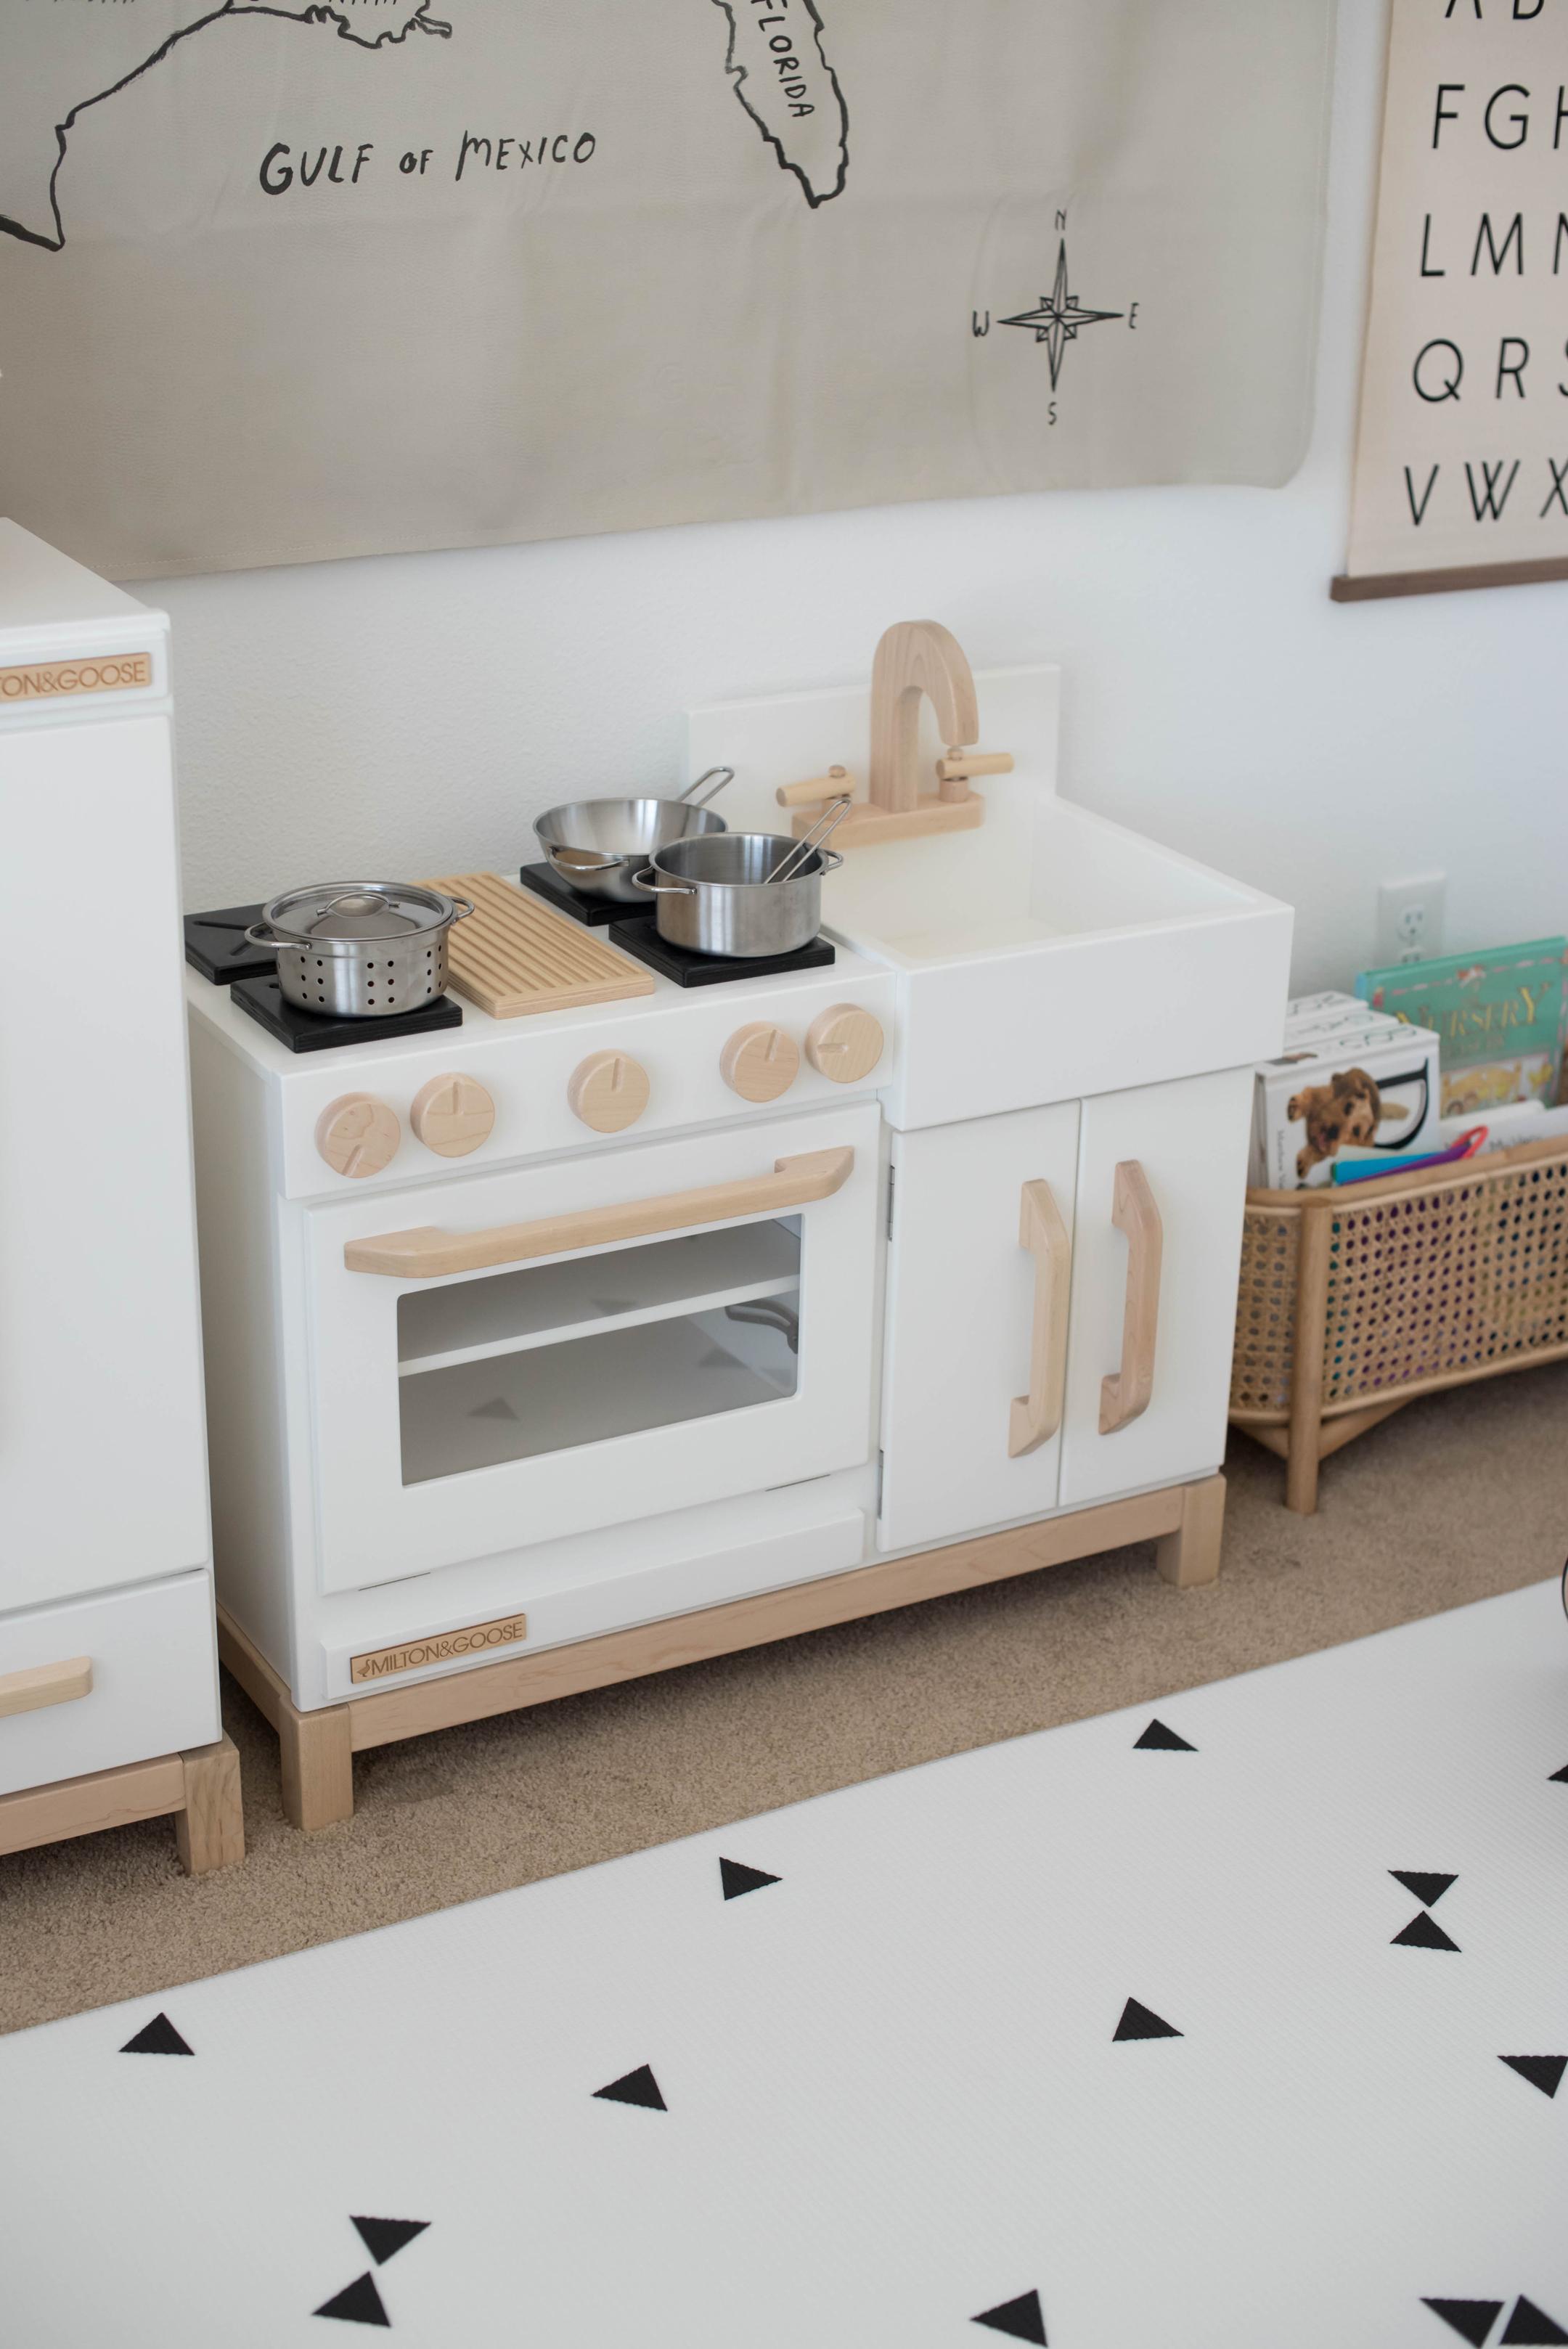 Milton & Goose Play Kitchen & Fridge Review - Crystalin Marie